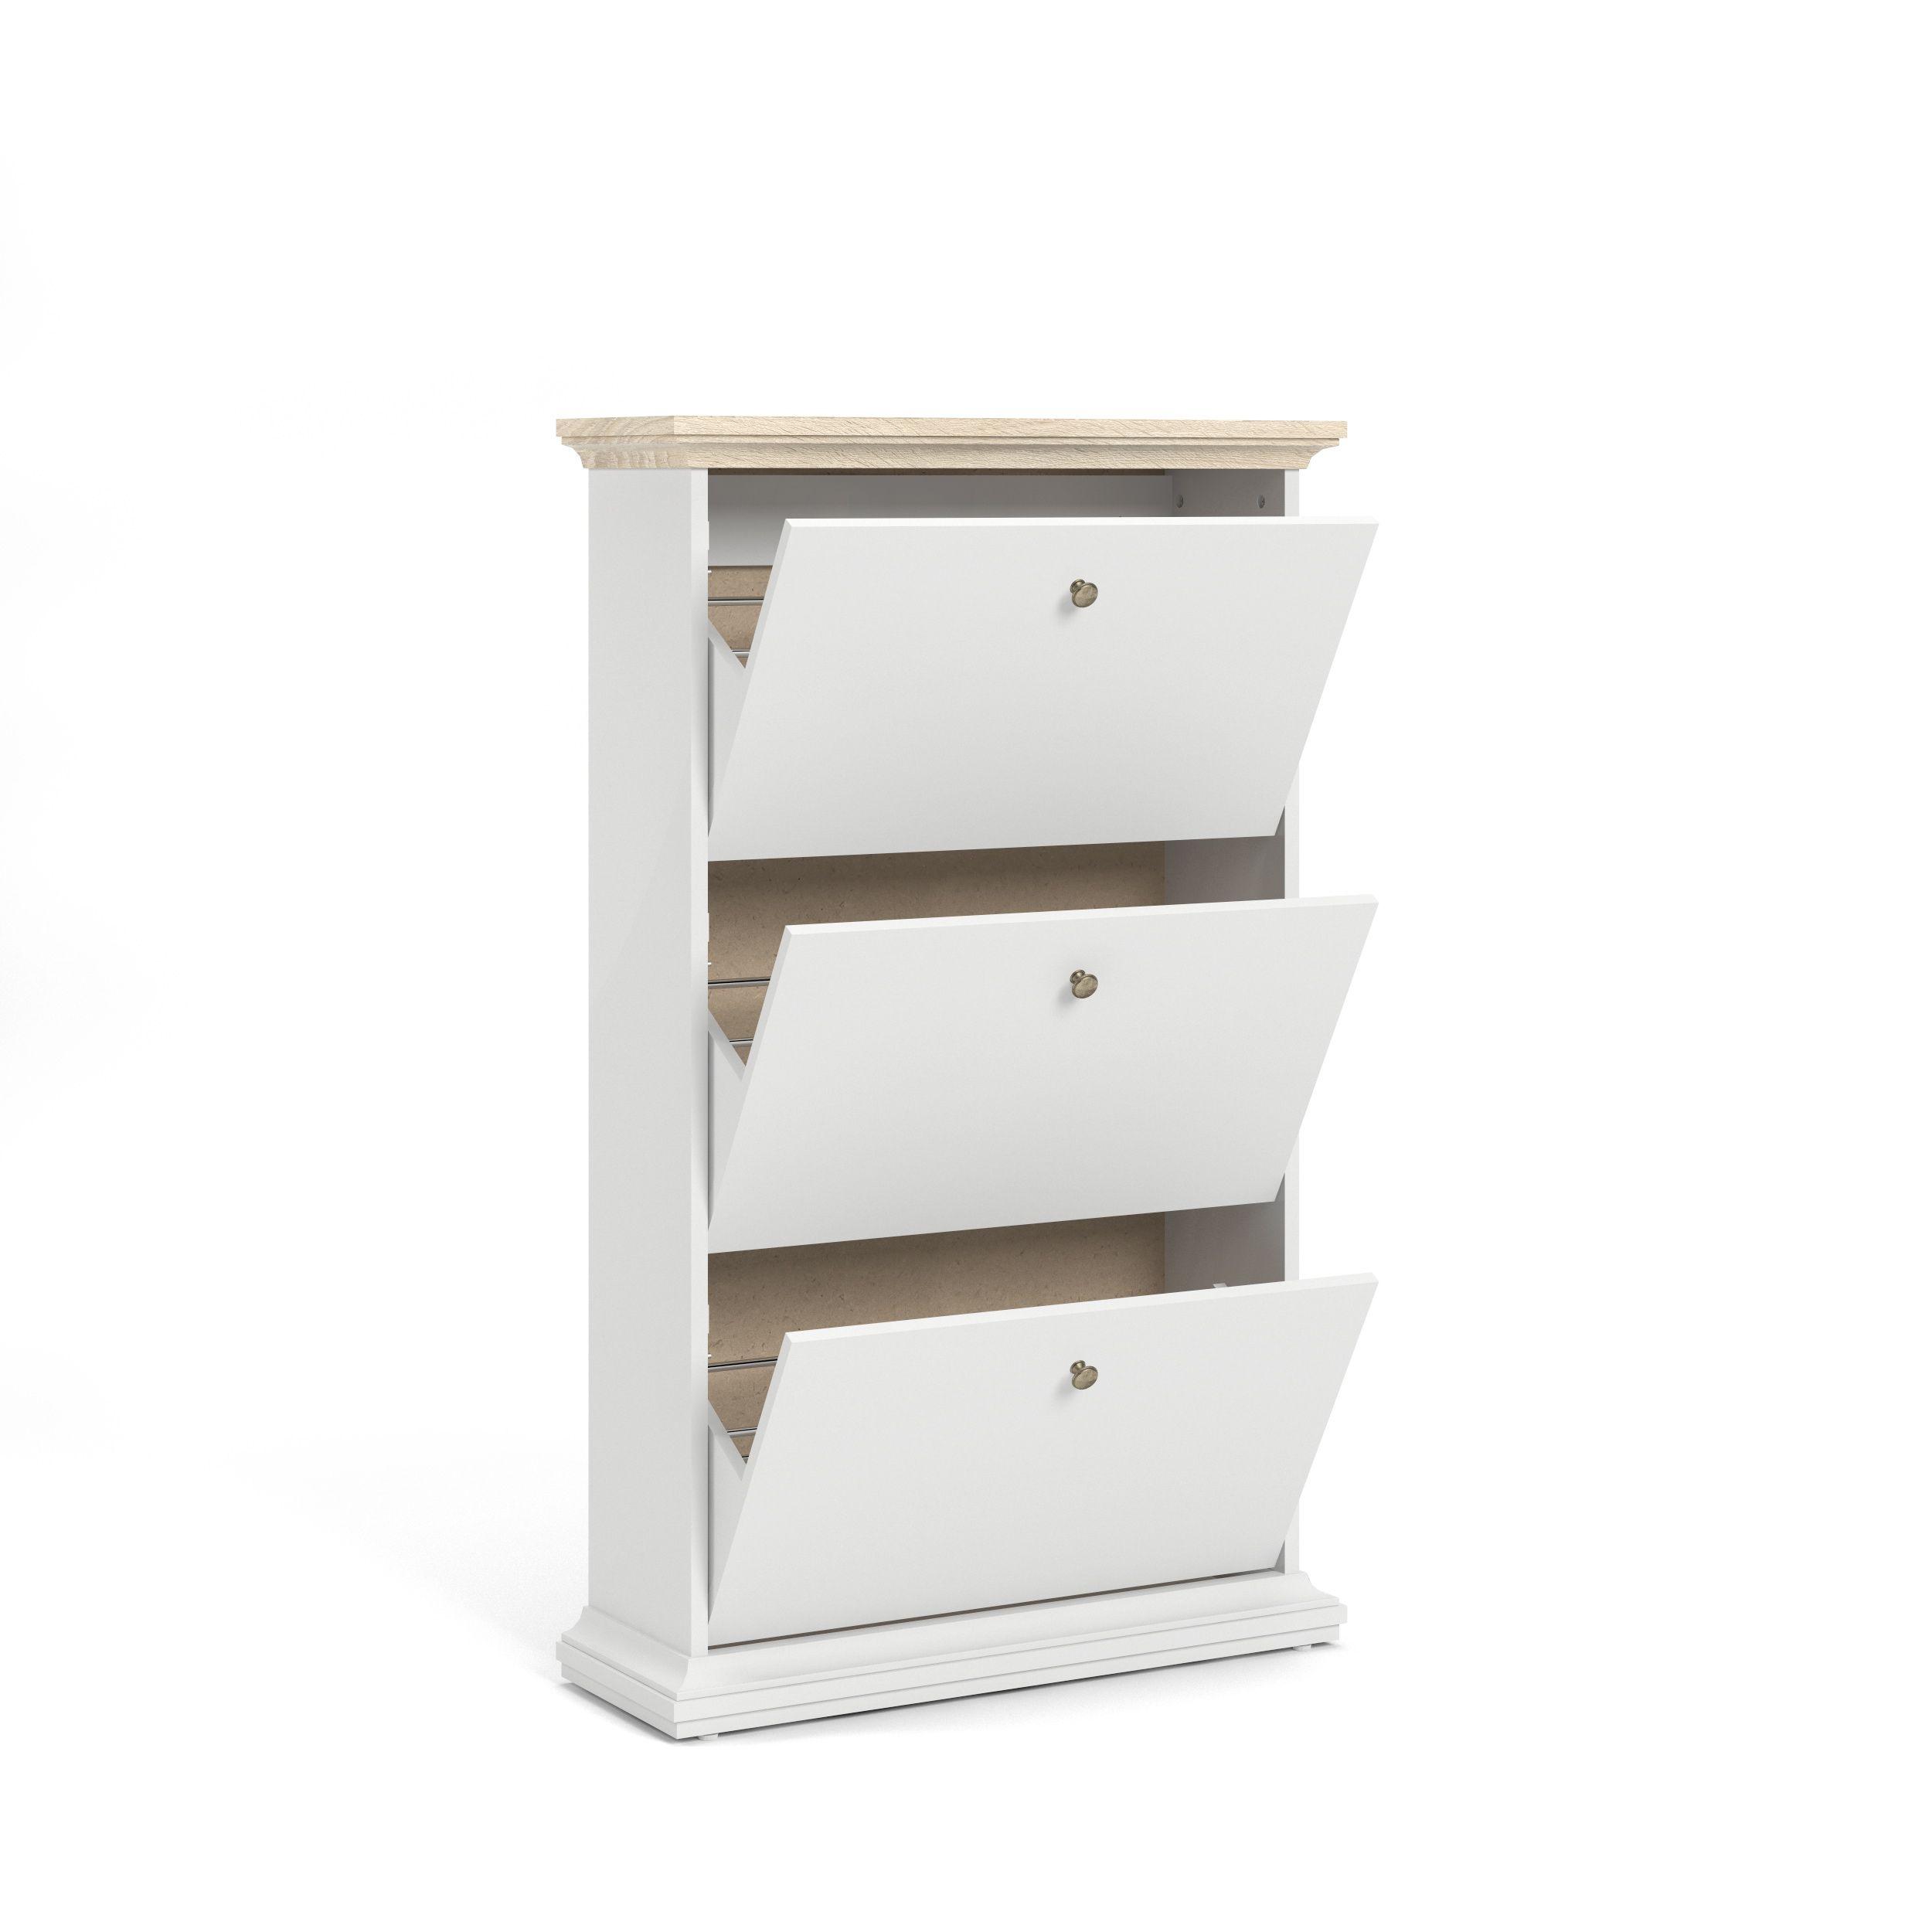 Paris Skoskab - Hvid/Lys træ - Hvidt skoskab med tre låger